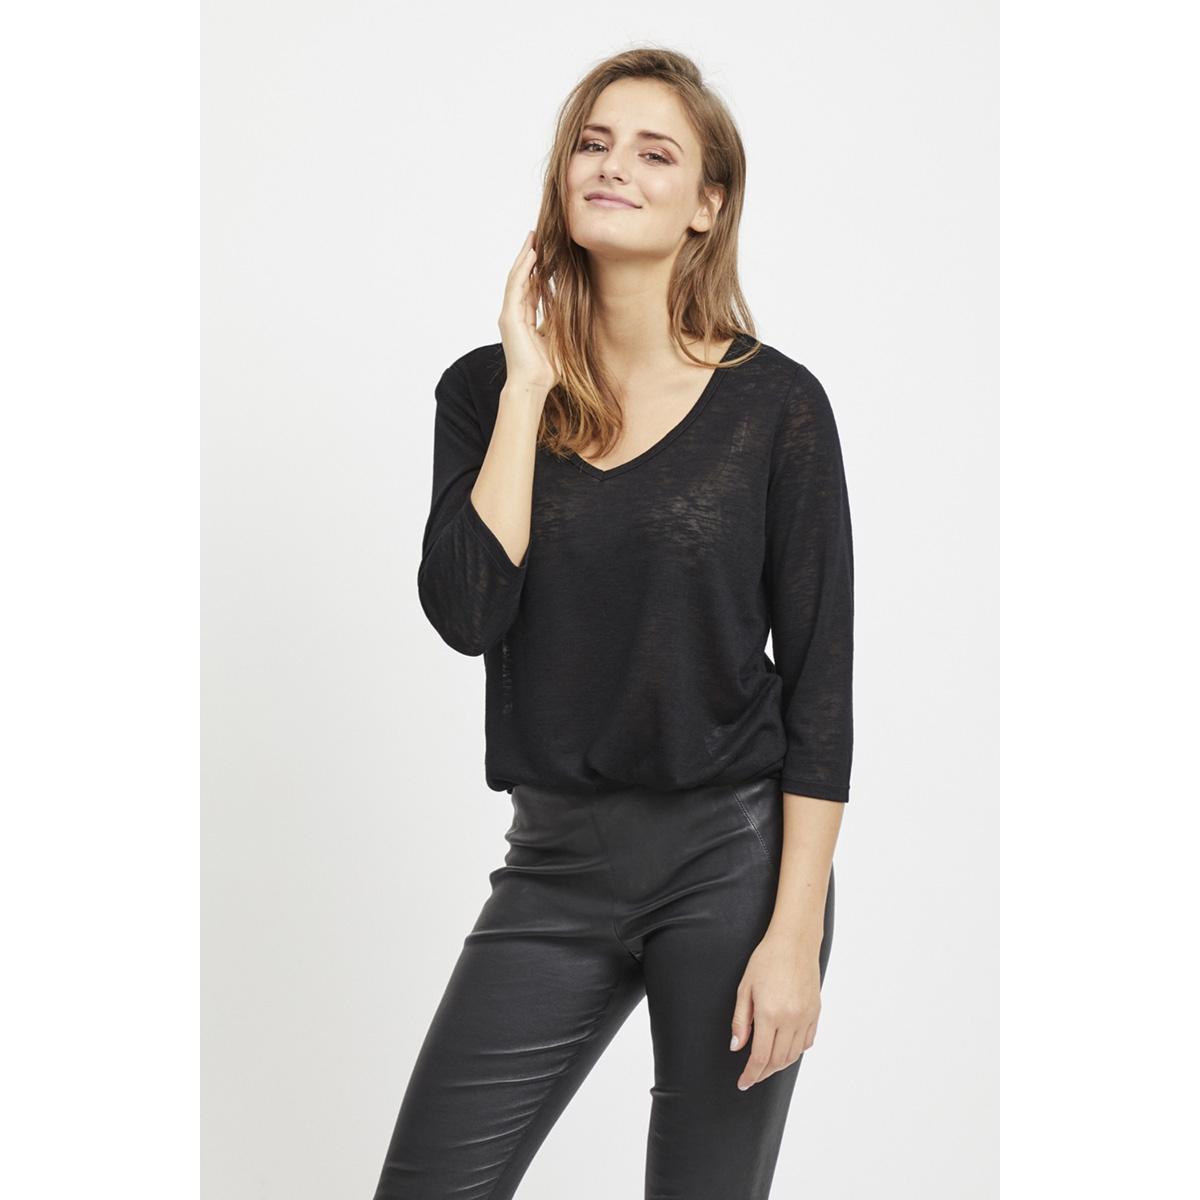 objtessi slub 3/4 top noos 23028539 object t-shirt black